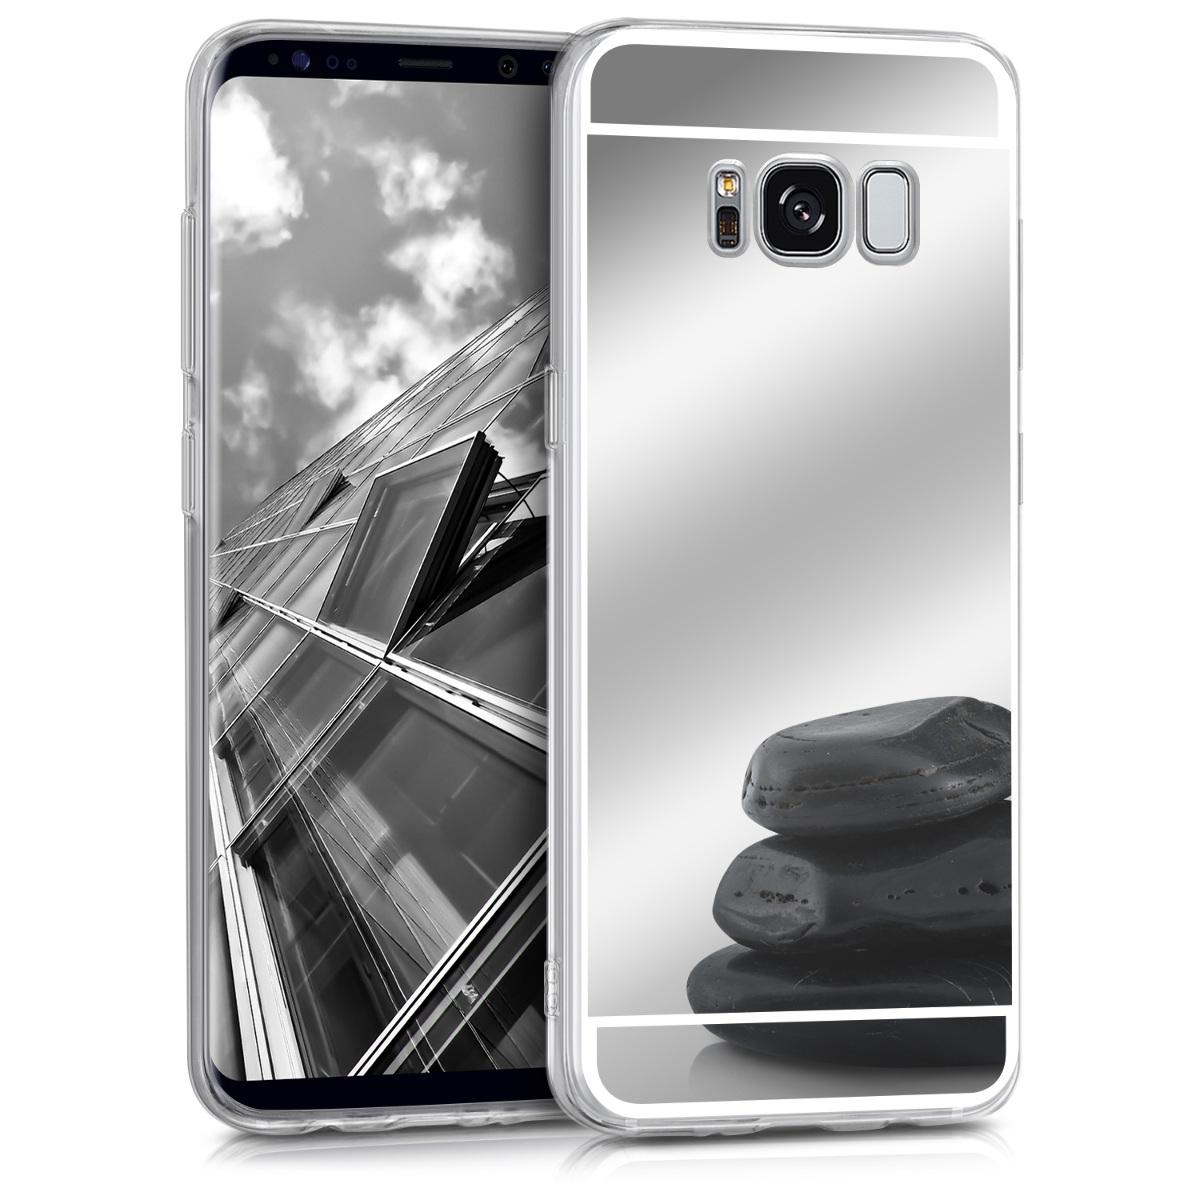 KW Θήκη Σιλικόνης (TPU) με Καθρέφτη Samsung Galaxy S8 - Silver Reflective (40982.42)